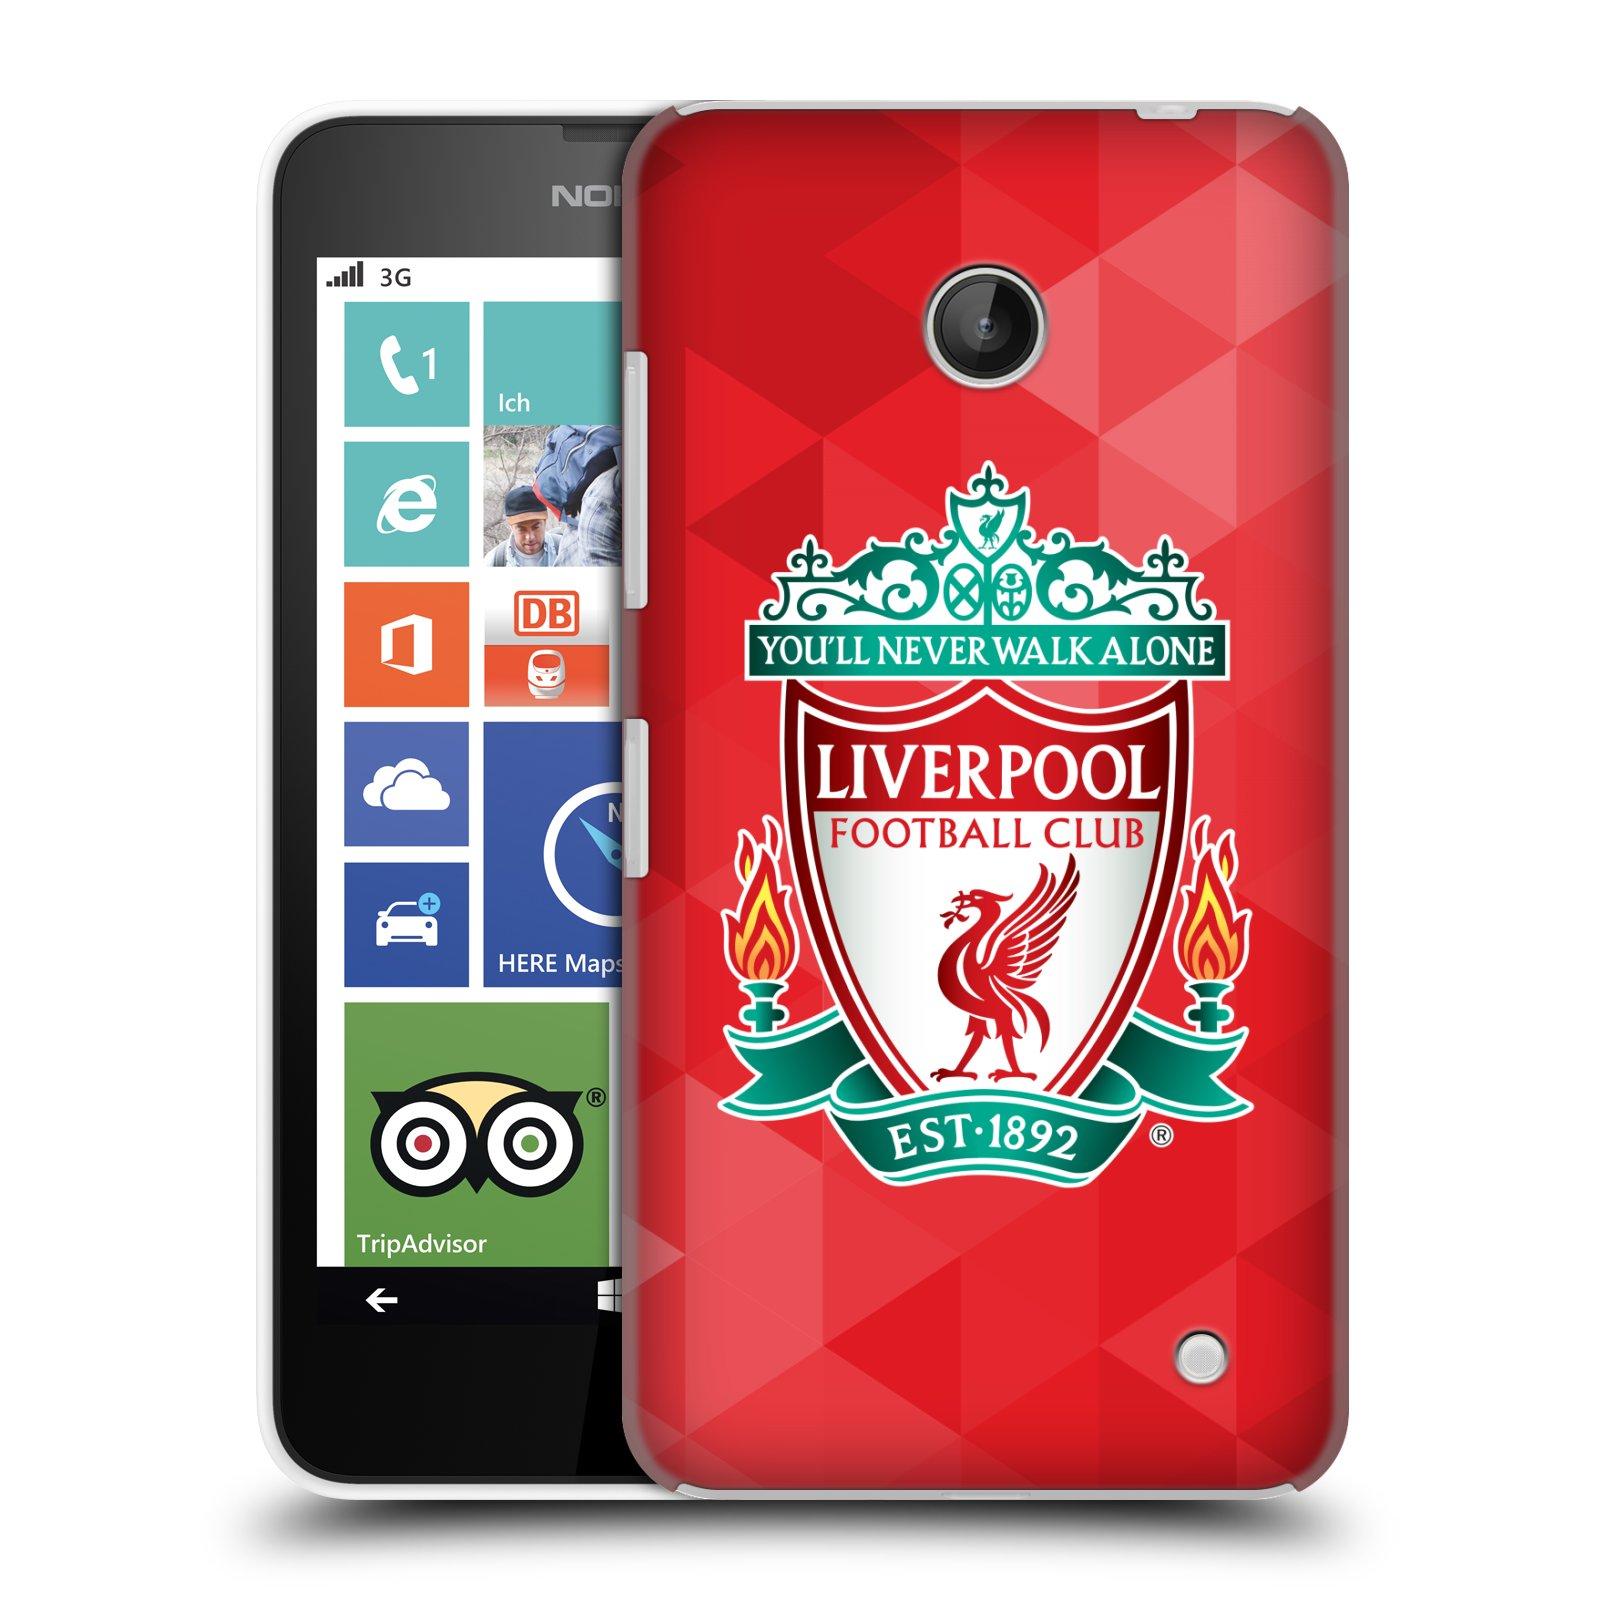 Plastové pouzdro na mobil Nokia Lumia 630 HEAD CASE ZNAK LIVERPOOL FC OFFICIAL GEOMETRIC RED (Kryt či obal na mobilní telefon Liverpool FC Official pro Nokia Lumia 630 a Nokia Lumia 630 Dual SIM)